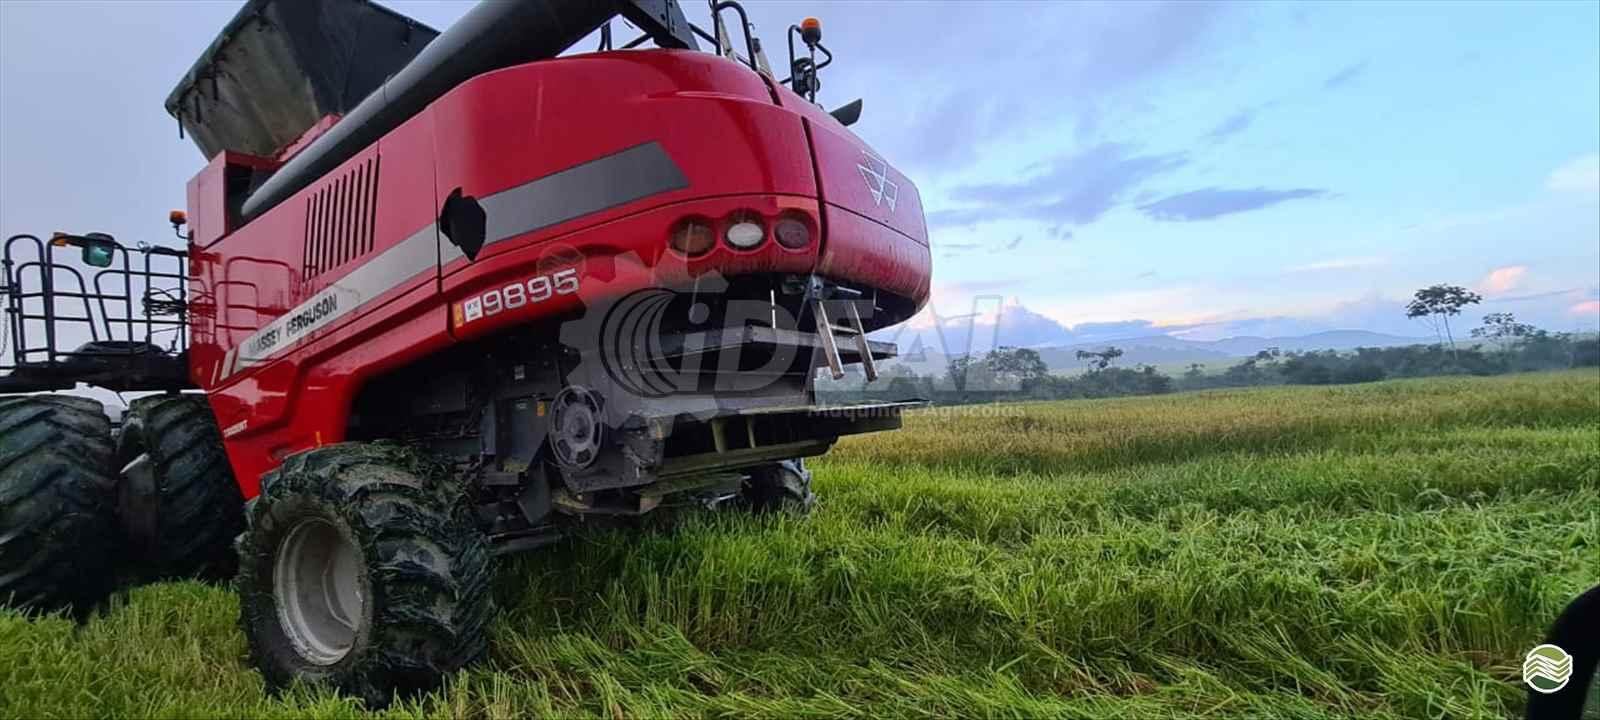 MASSEY FERGUSON MF 9895  2018/2018 Ideal Máquinas Agrícolas